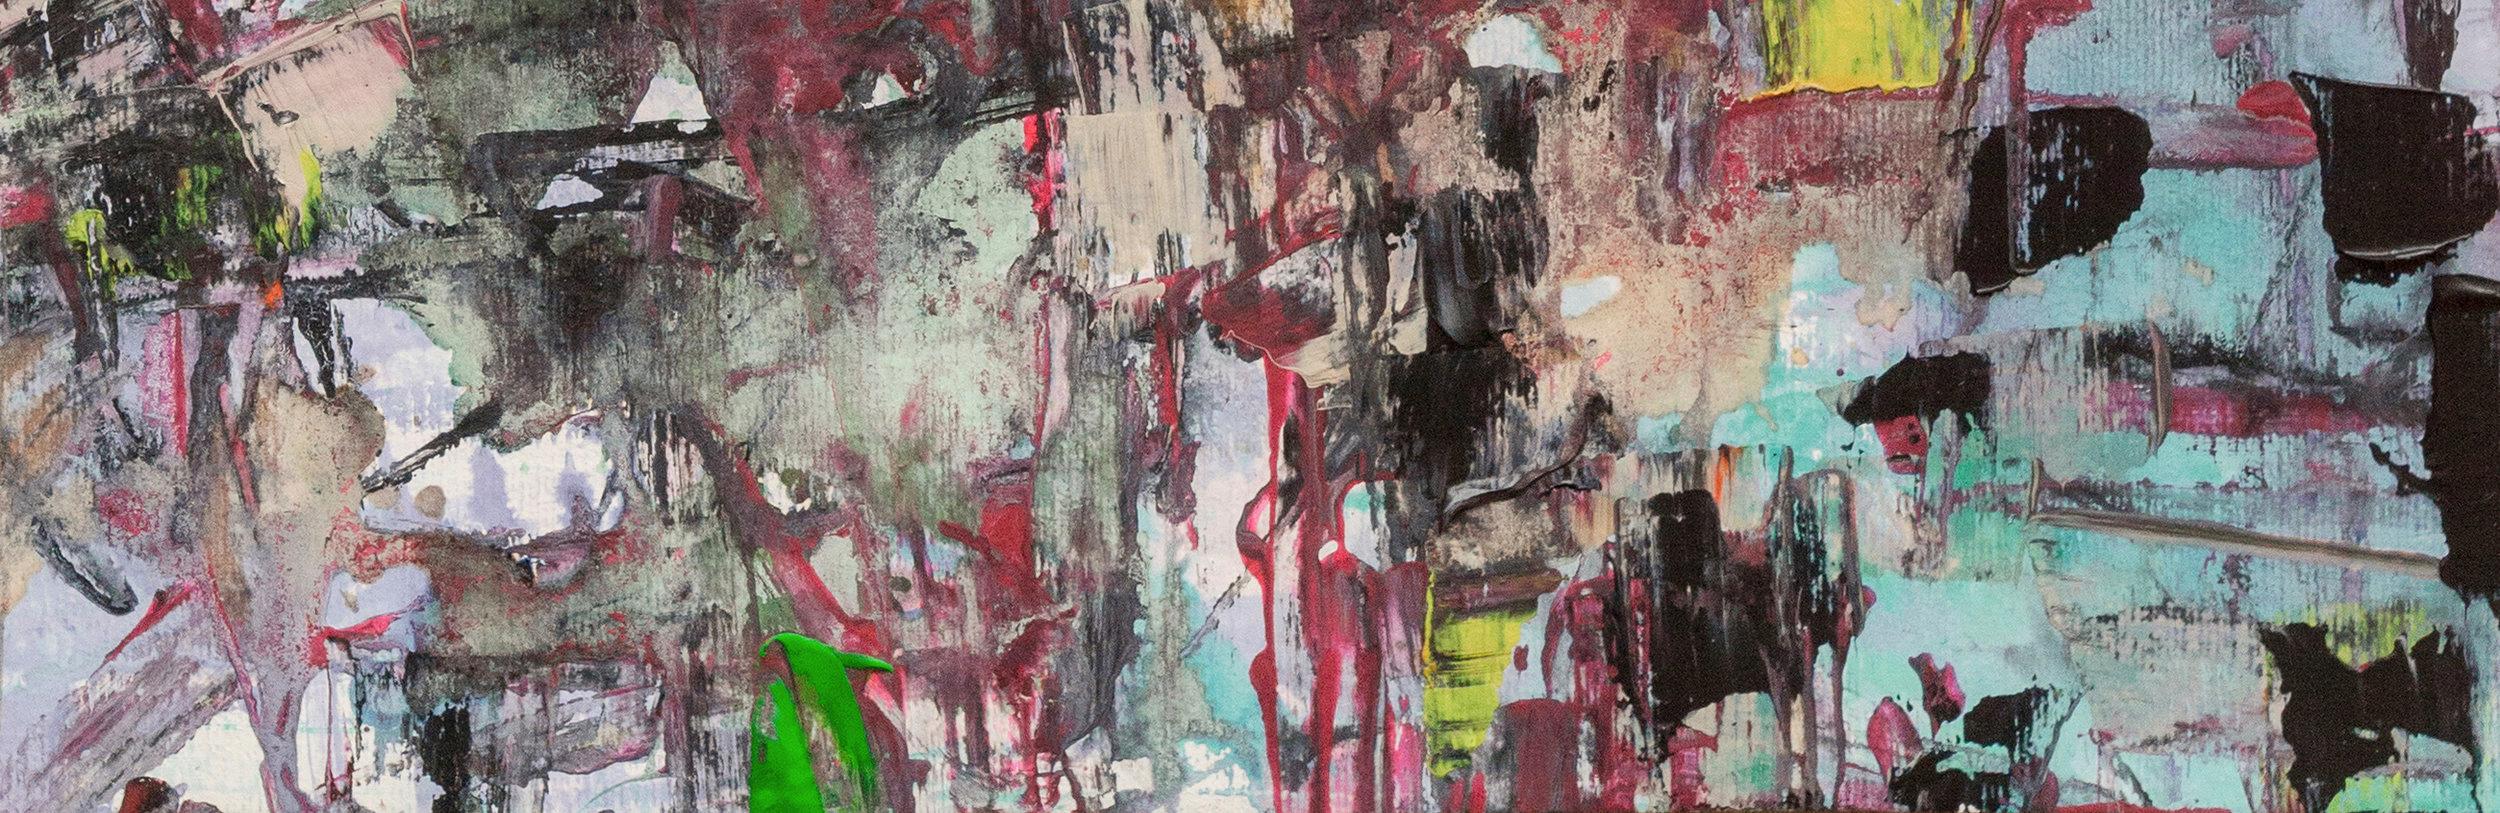 bonjourmolotov+Faded+waltzes+Illustration+Ilustracao+painting+pintura+acrylic+acrílico+canvas+tela+paper+cardboard+mdf+Andre+Gigante+B03NN5.jpg